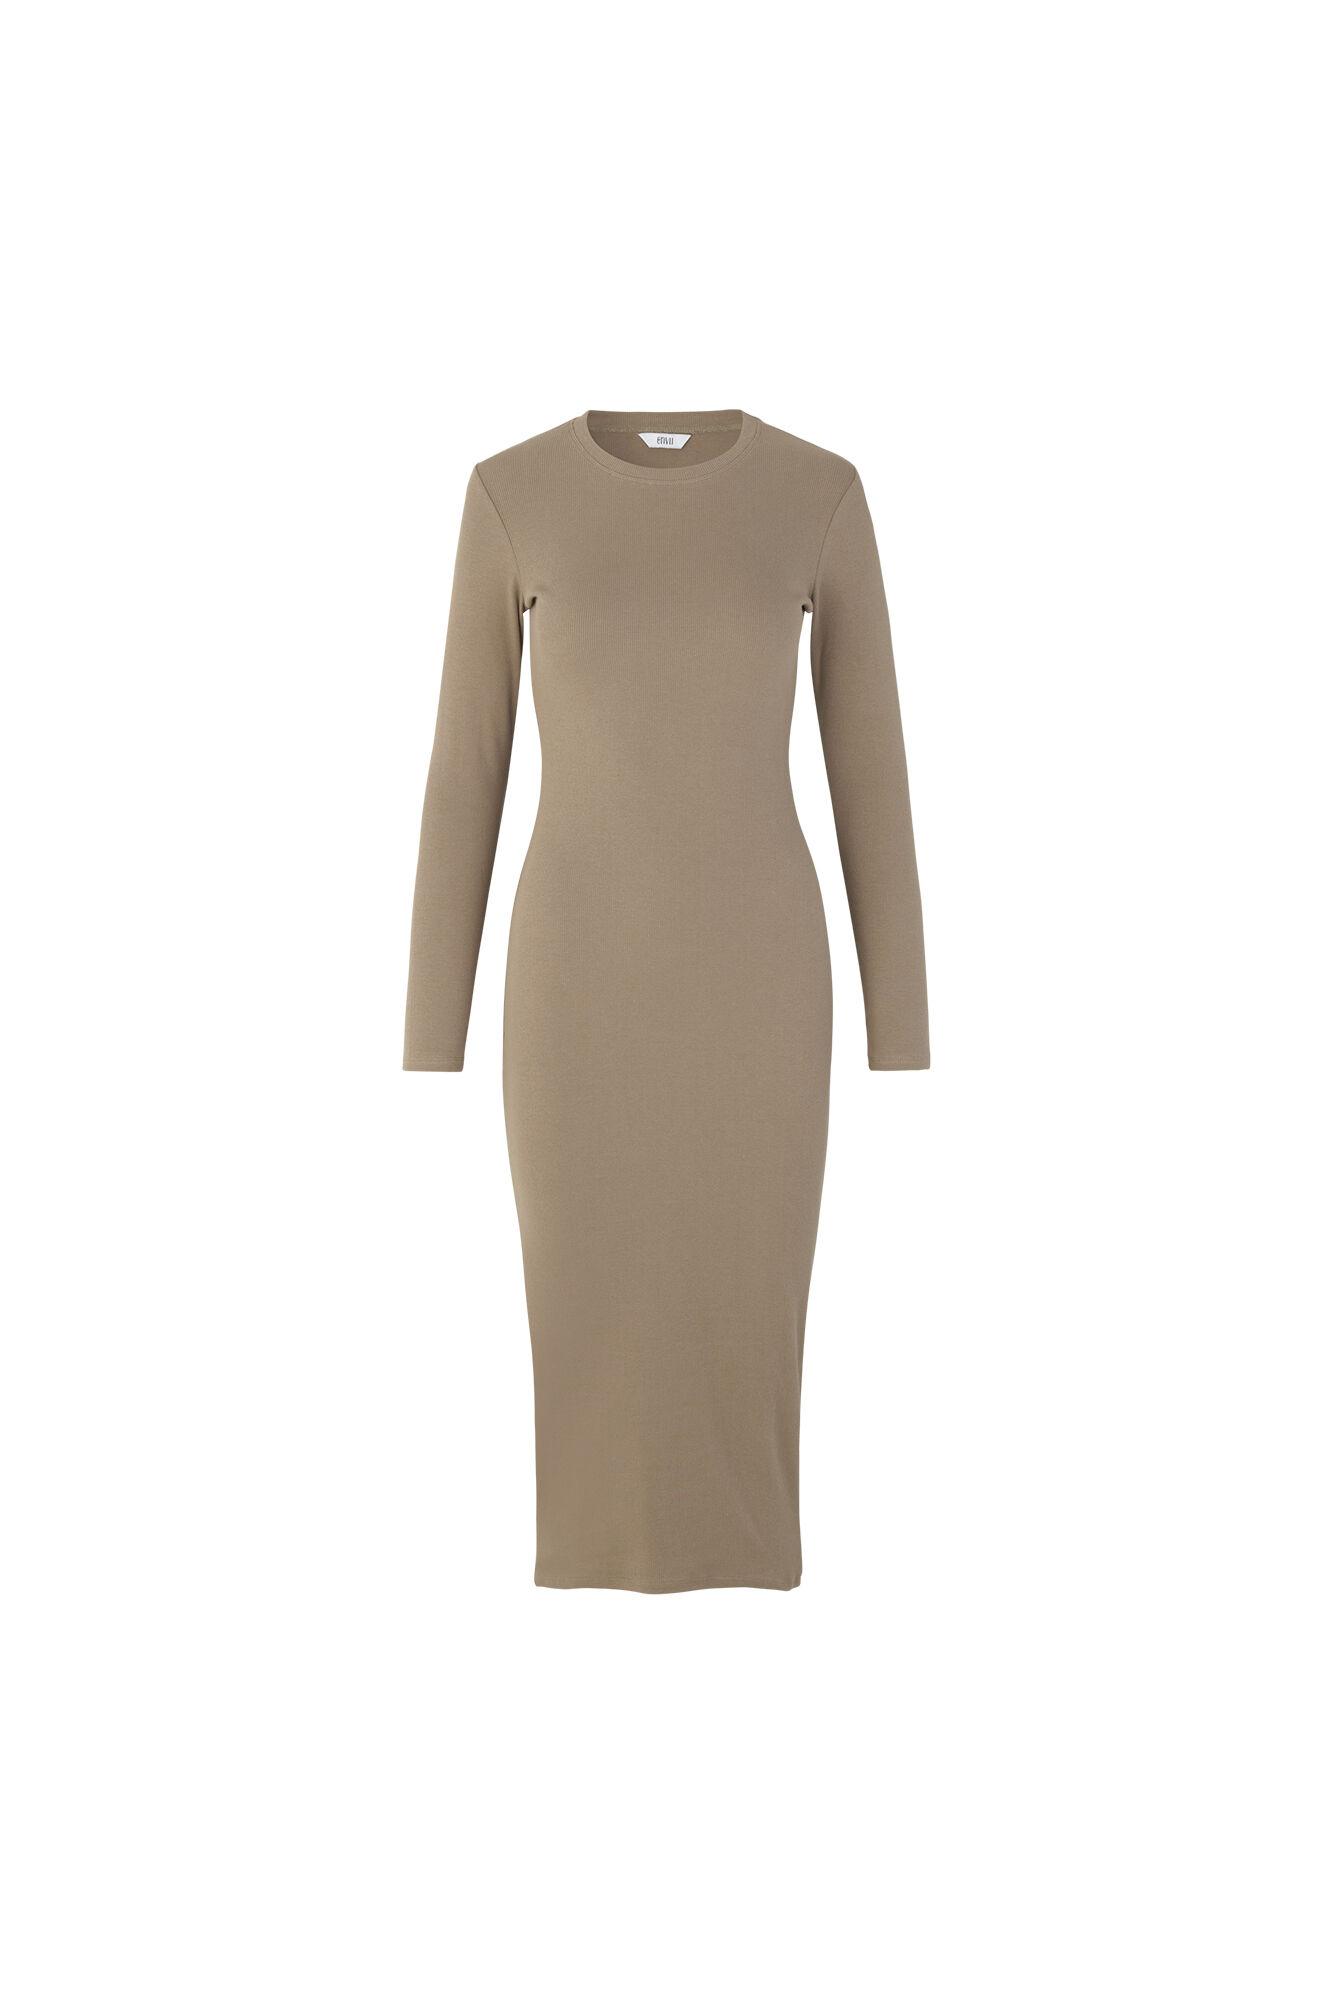 ENALLY LS DRESS 5314, SEPIA TINT